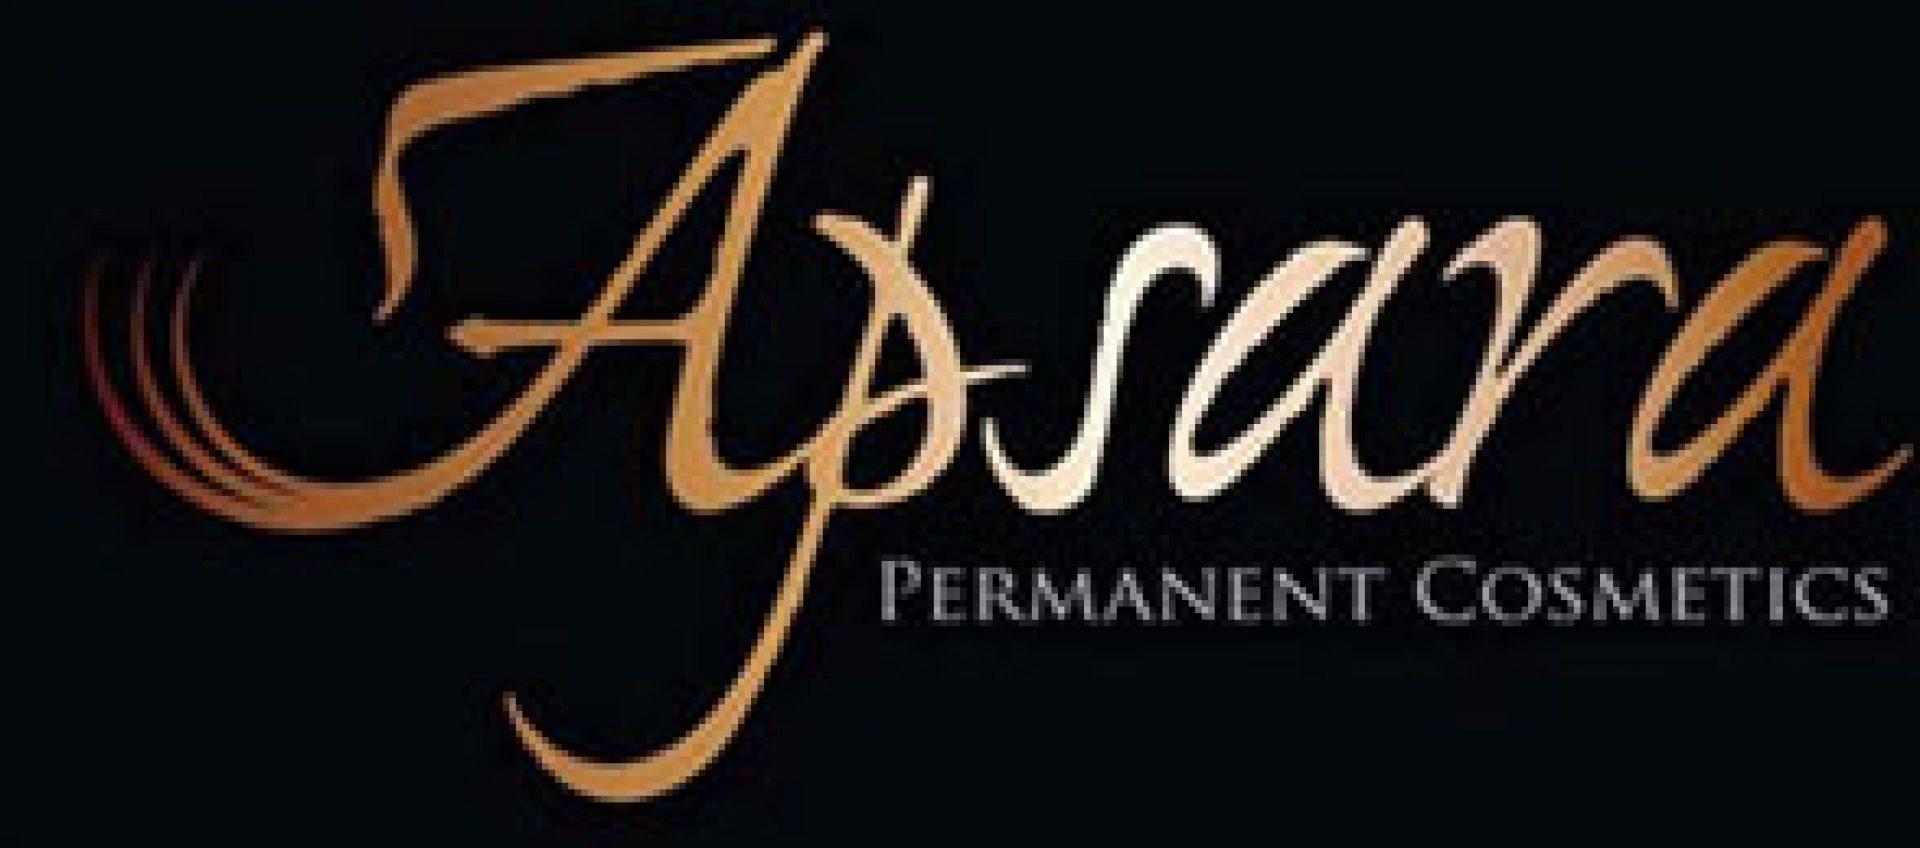 Welcome to Apsara Cosmetics